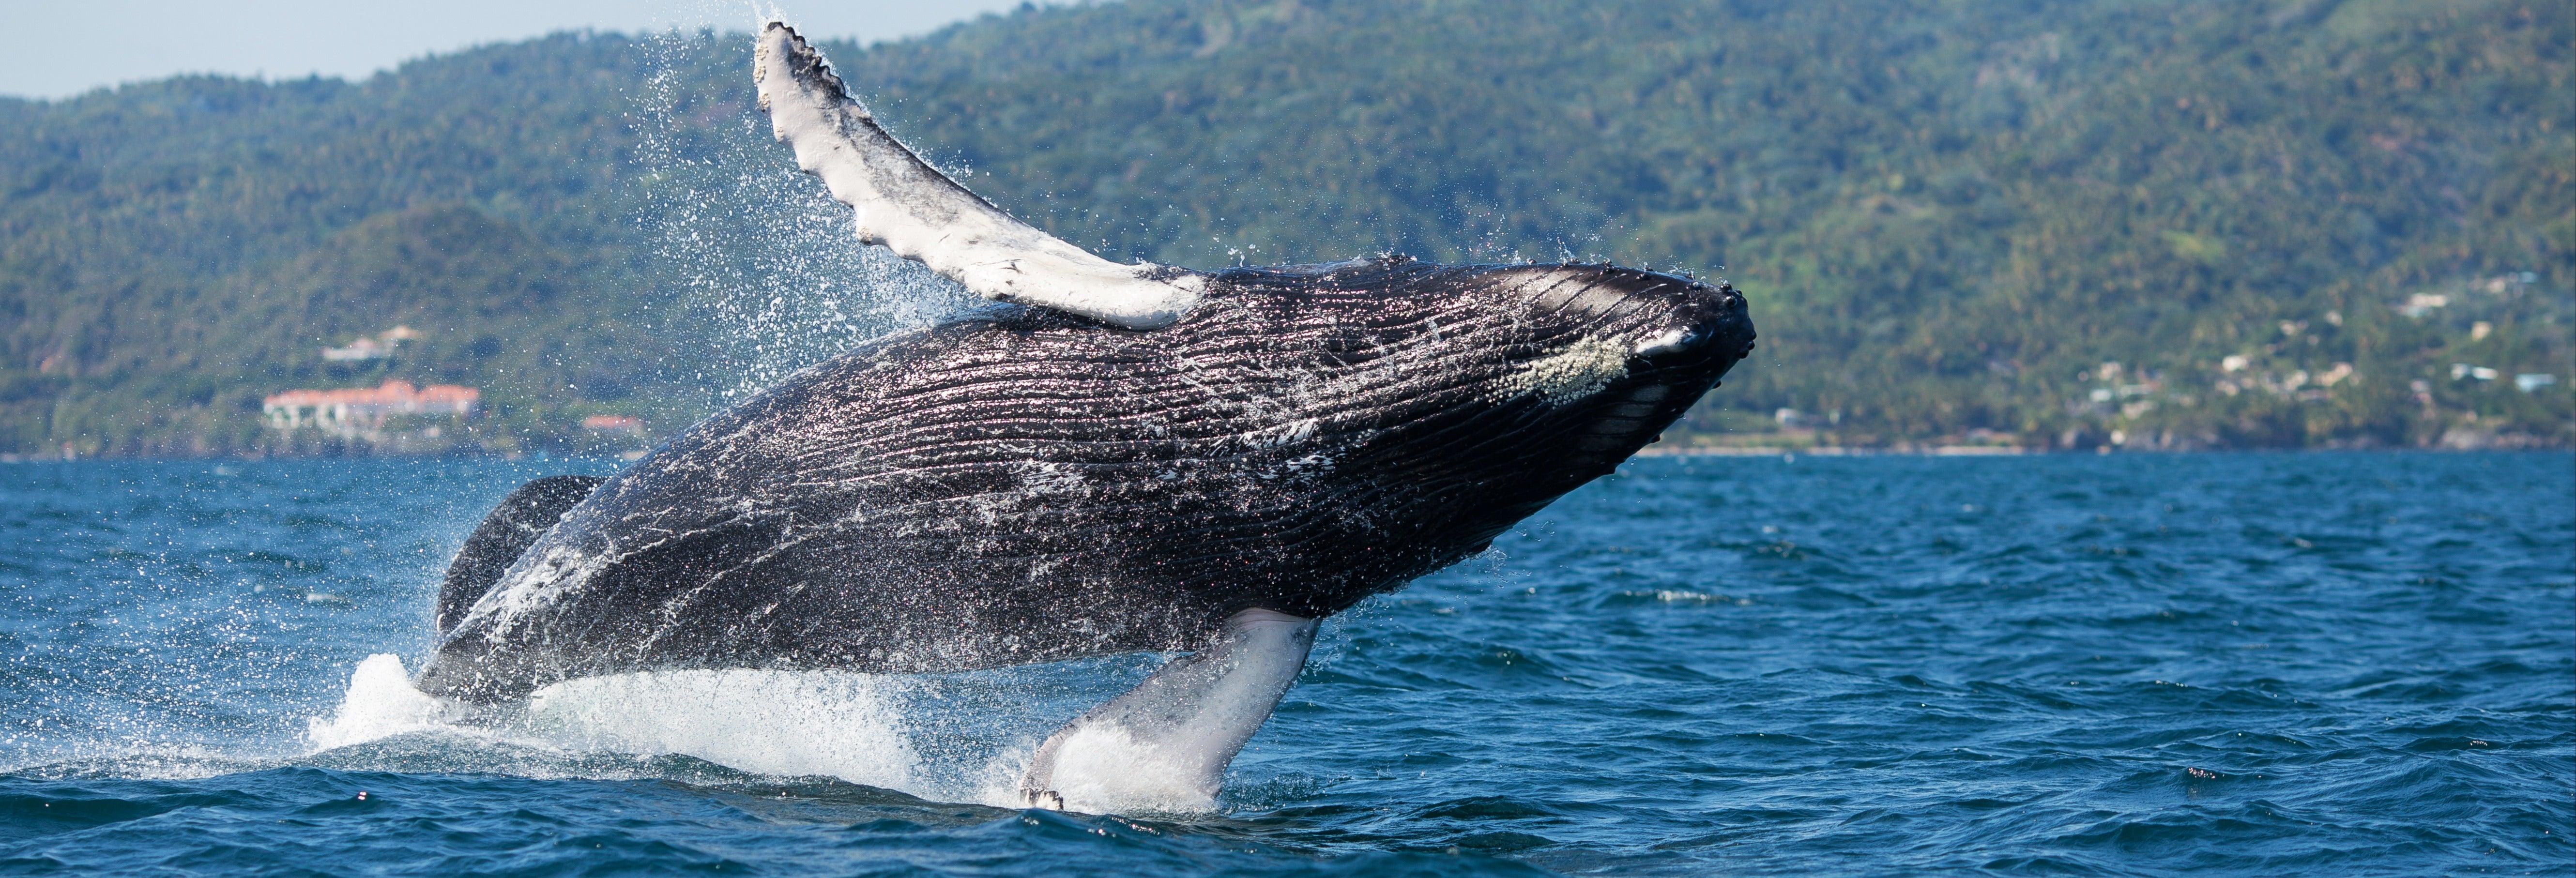 Avvistamiento di balene + Cayo Levantado